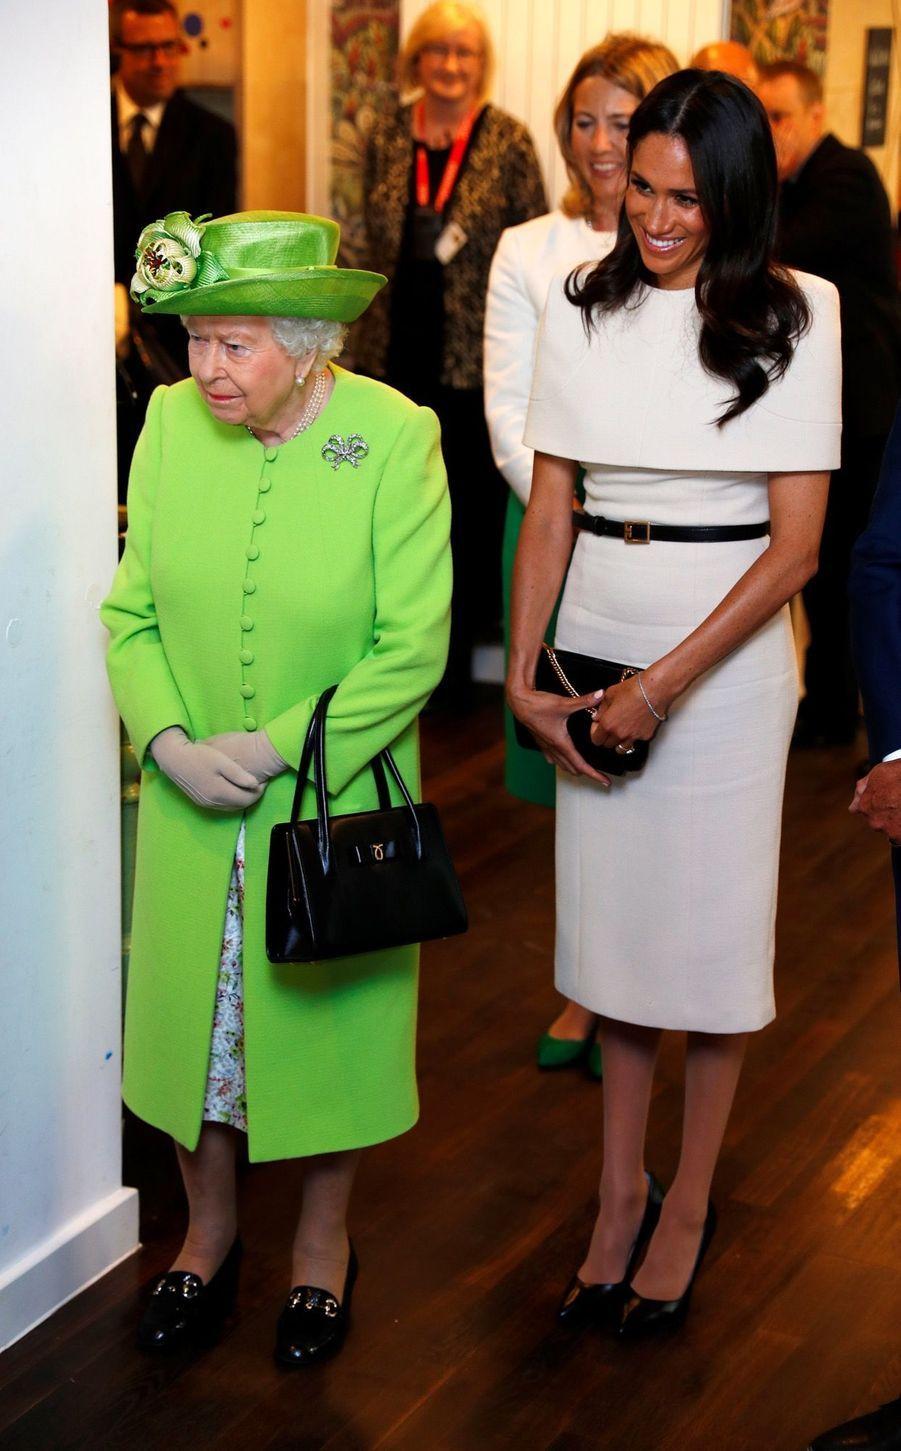 Meghan Markle Et La Reine Elizabeth II En Viste Dans Le Nord De L'Angleterre ( 20